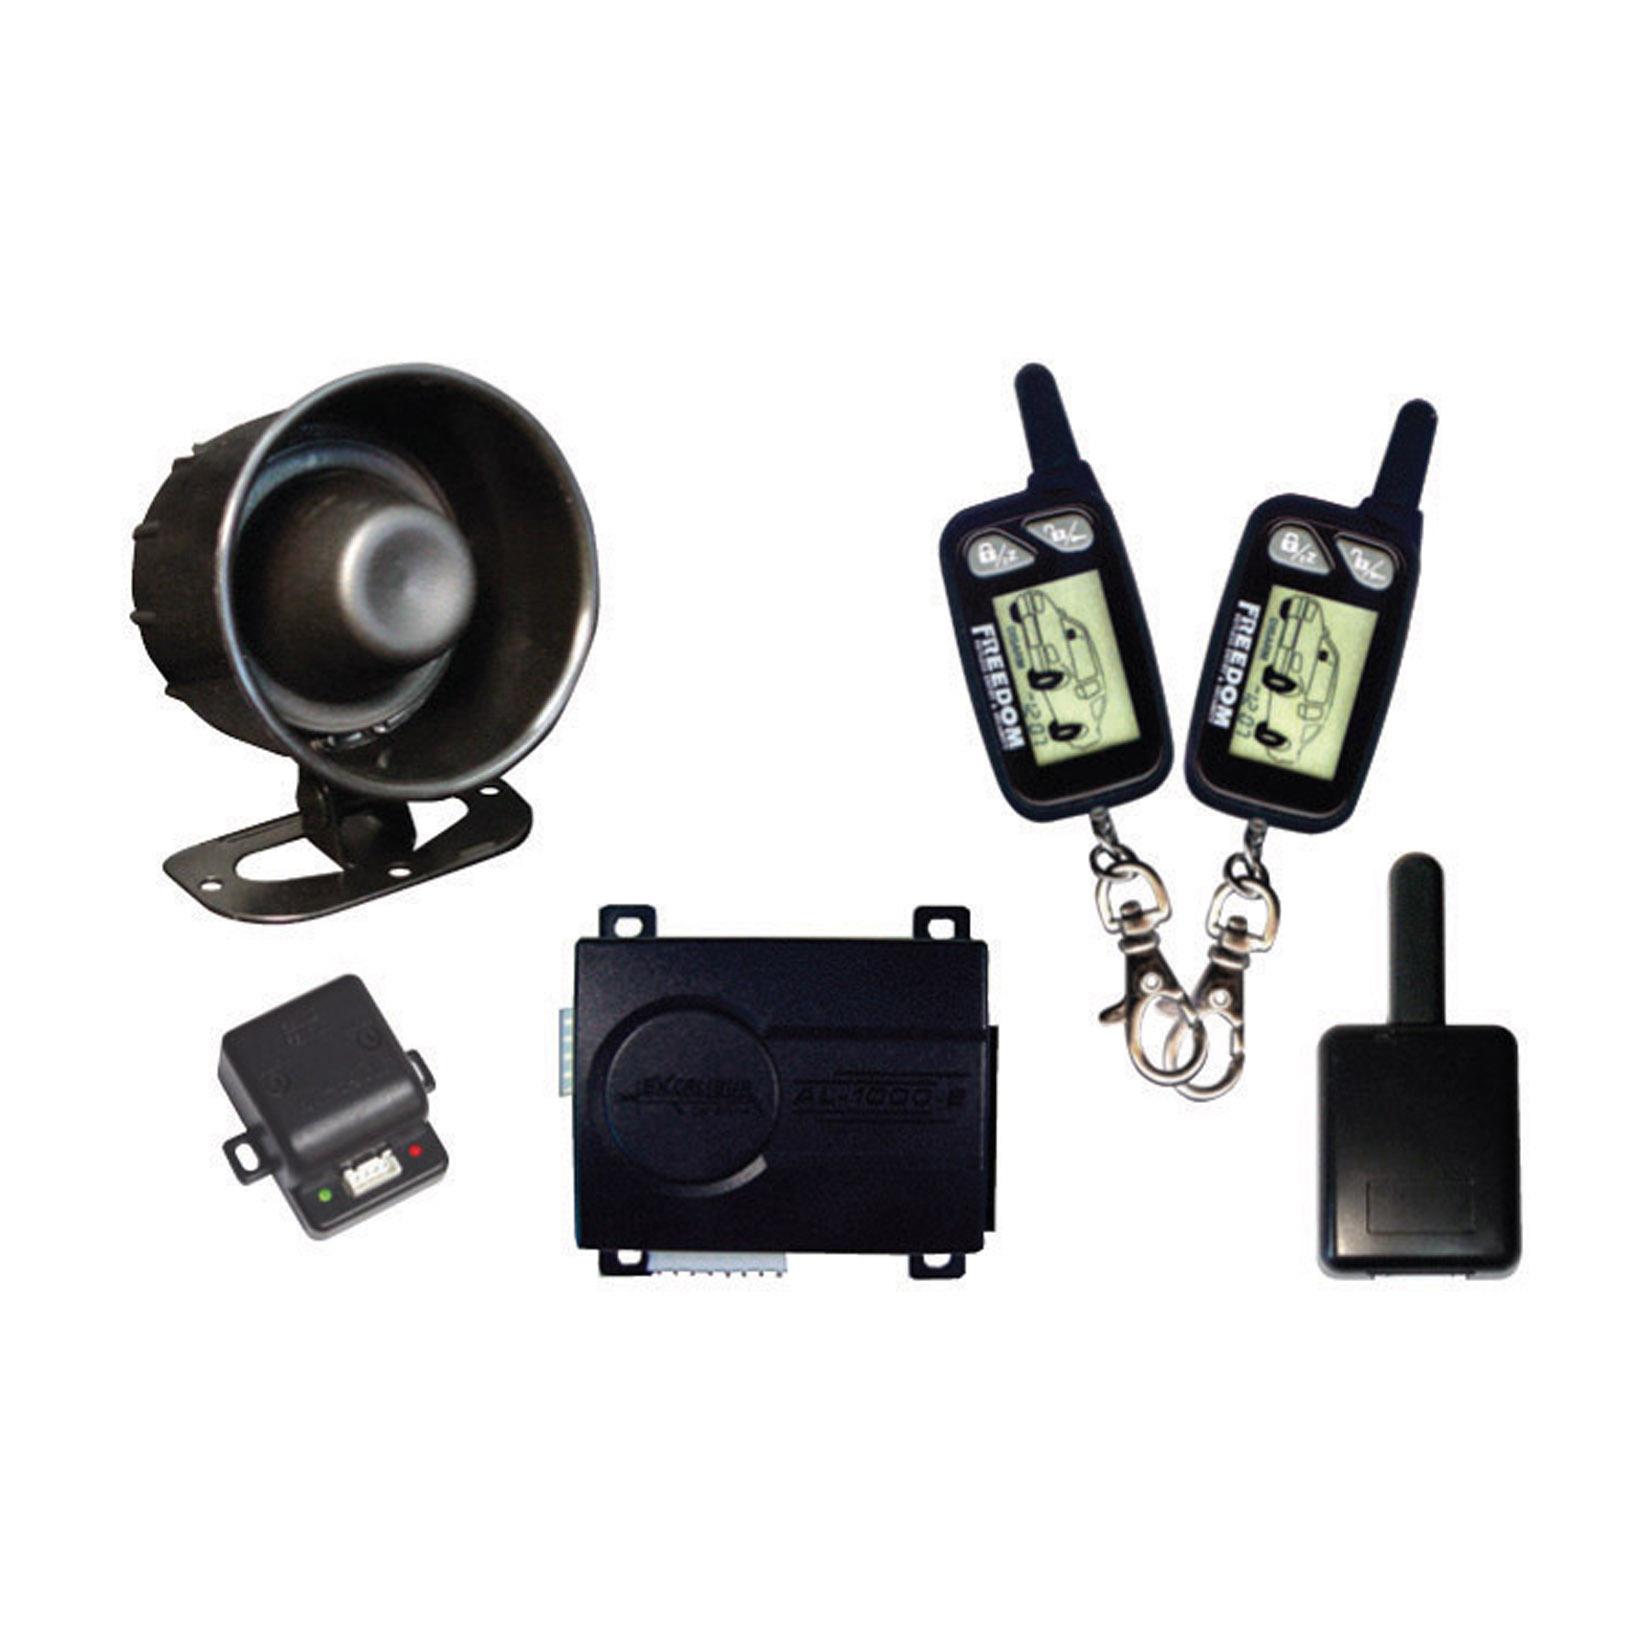 Excalibur K9-eclipse2 Lcd 2-way W/ Passive Keyless - 2-way - 2 X Transmitters - 1500 Ft - Shock Sensor (k9eclipse2)